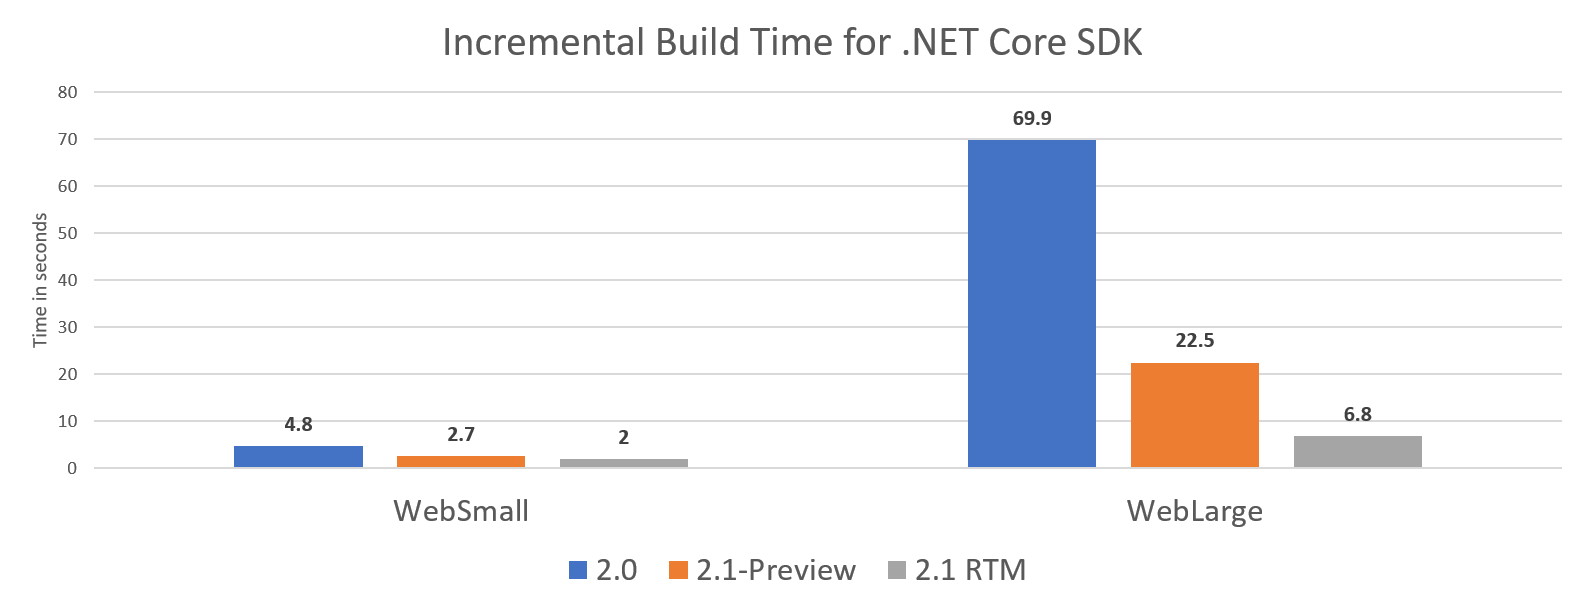 Nom : incremental-build-core-2-1-sdk.png Affichages : 4531 Taille : 20,4 Ko